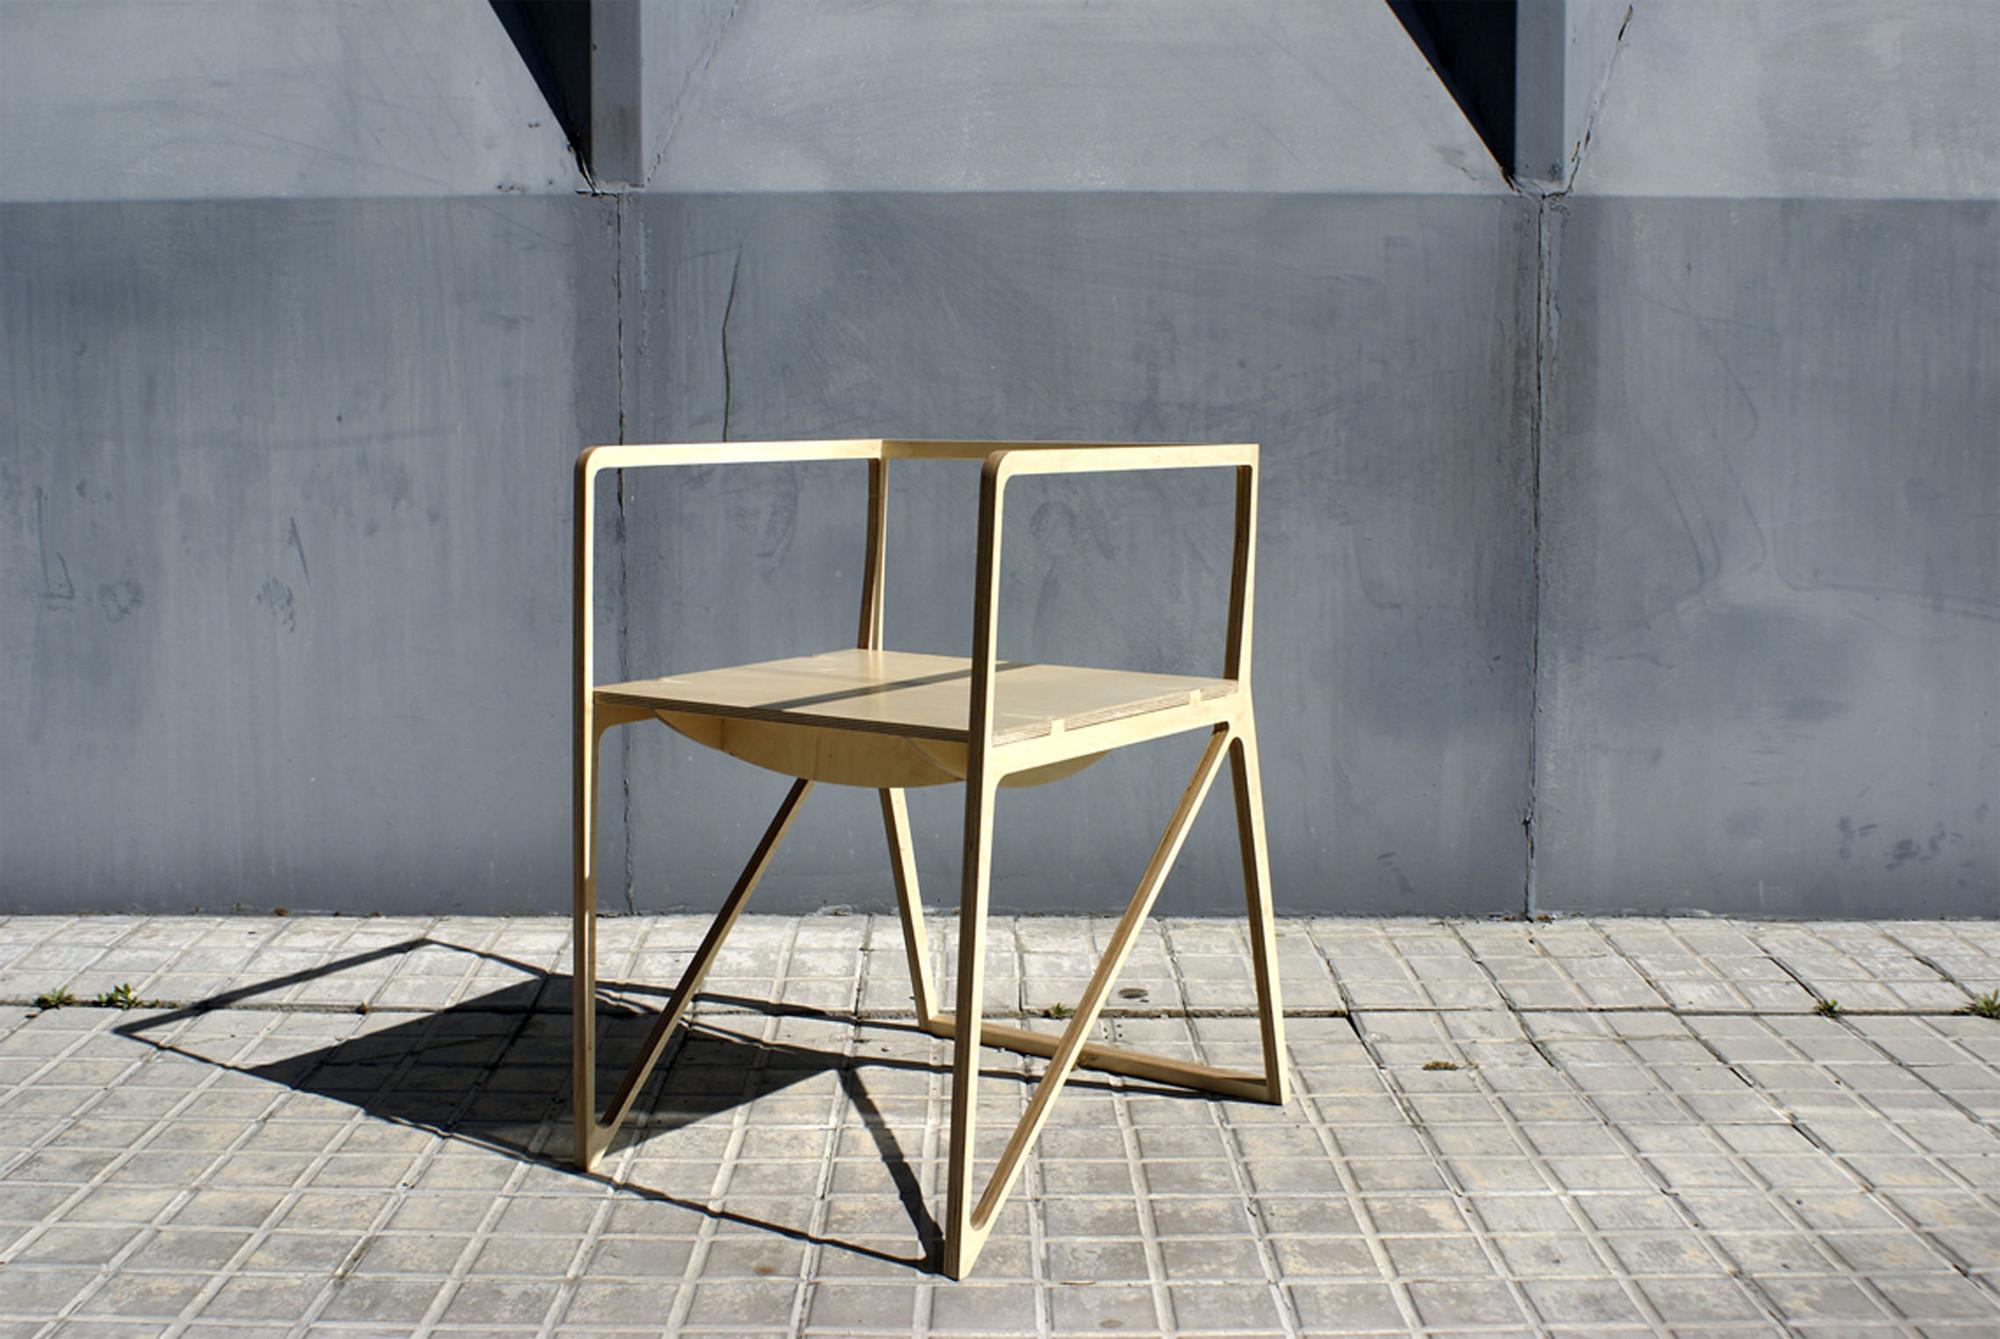 Galer a de silla brace ignacio hornillos design studio 2 for Studio design sillas